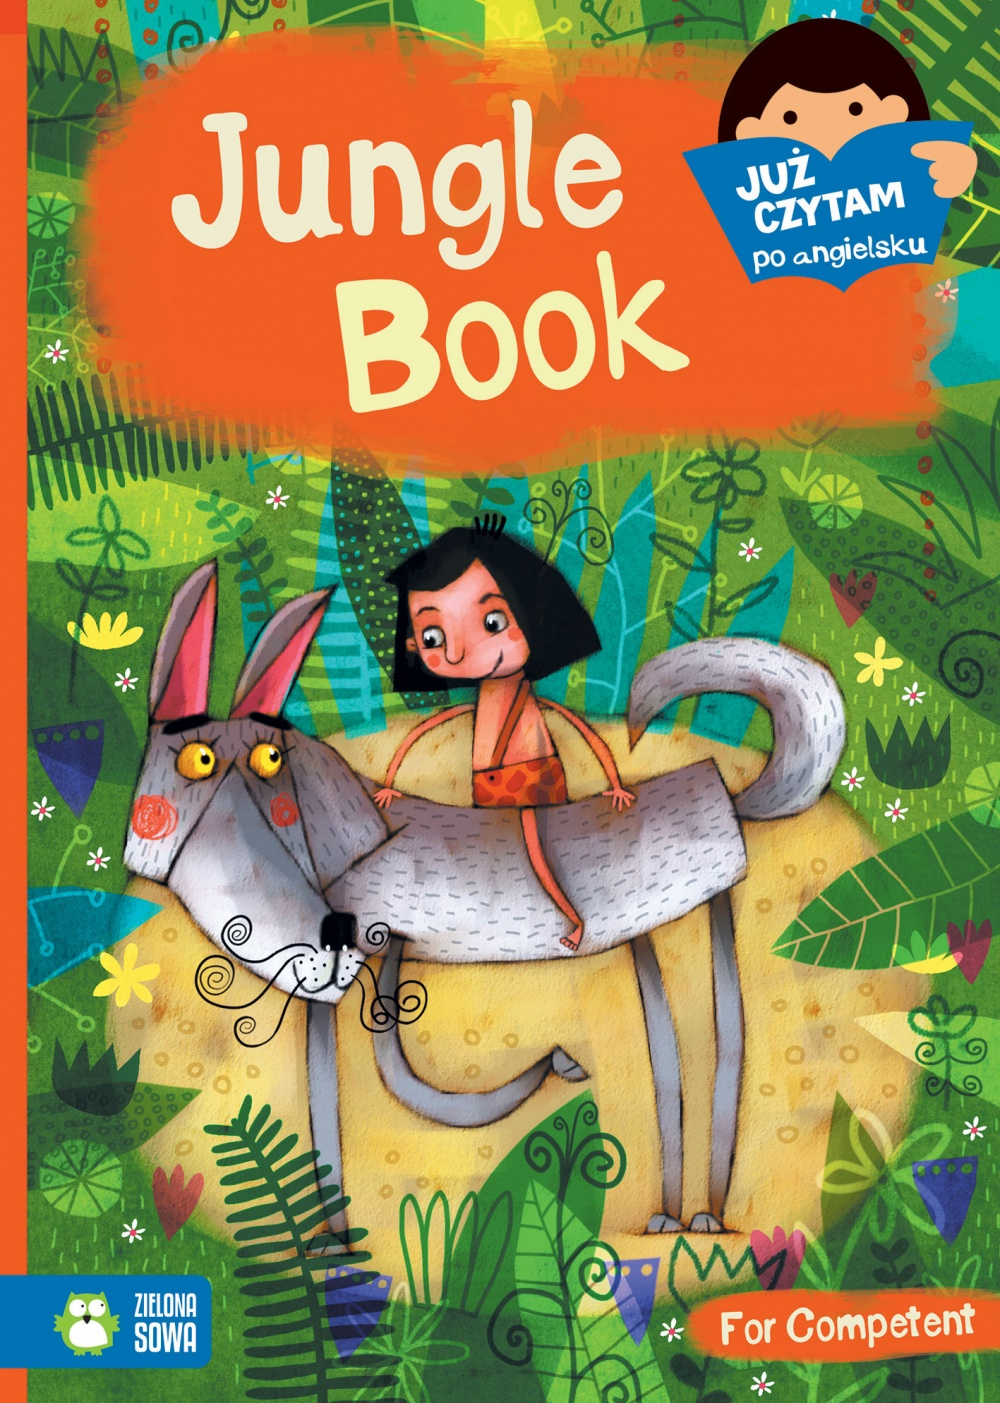 Już czytam po angielsku. Jungle Book